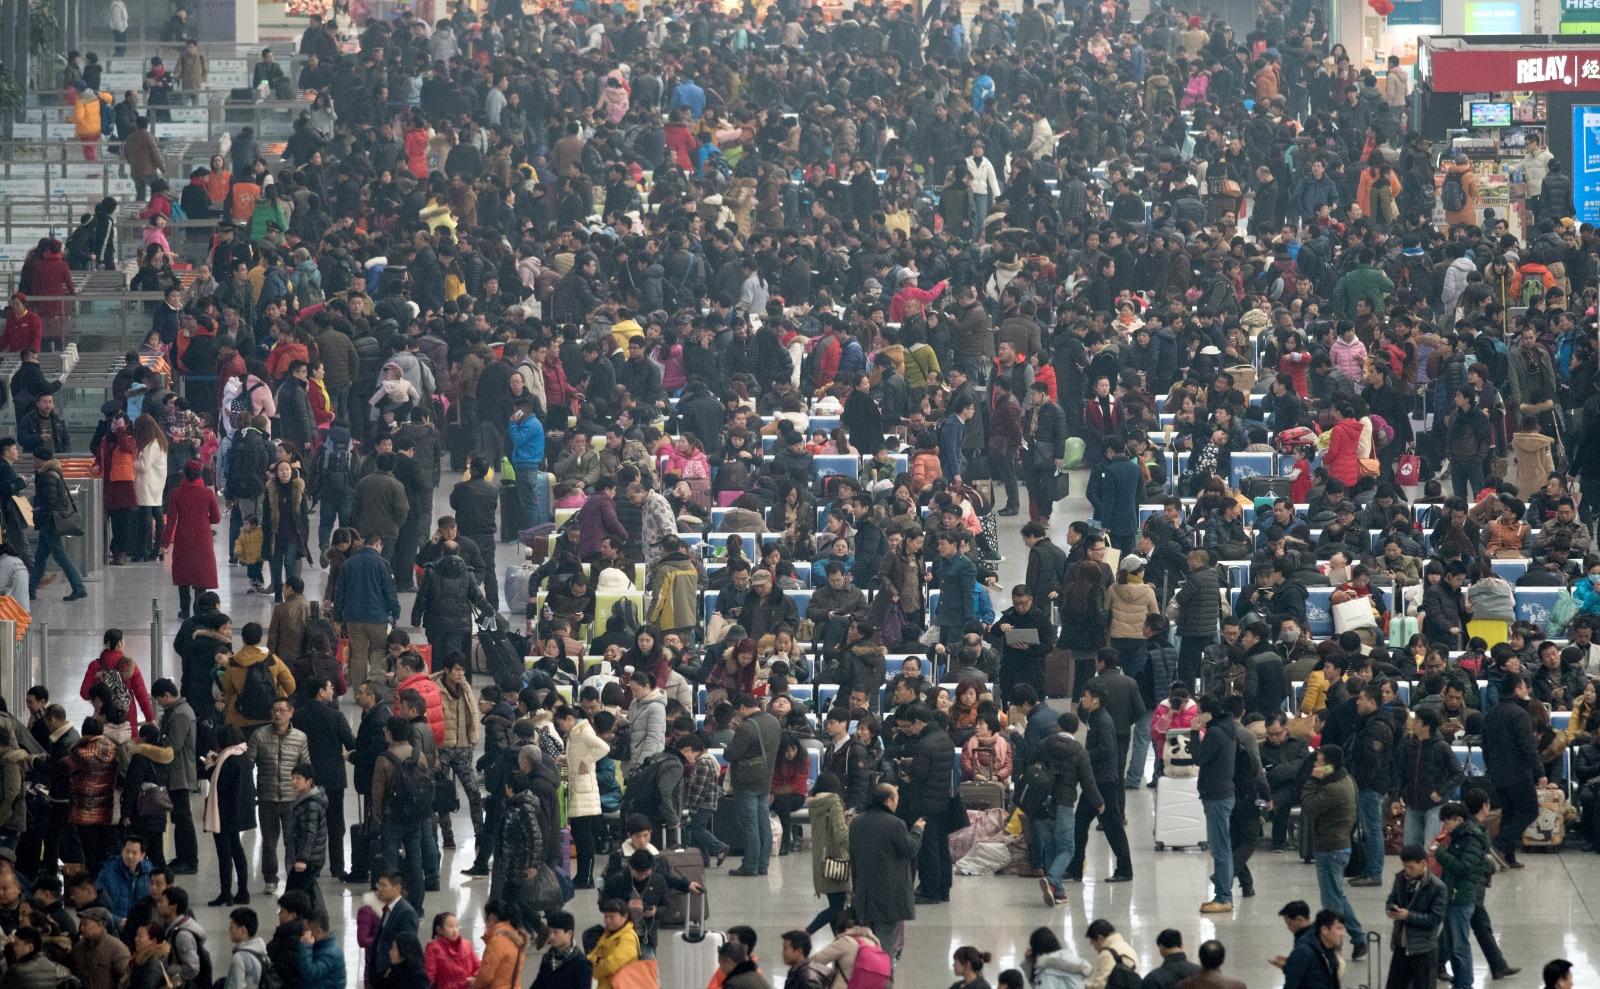 Chinese New Year Chunyun The Largest Annual Human